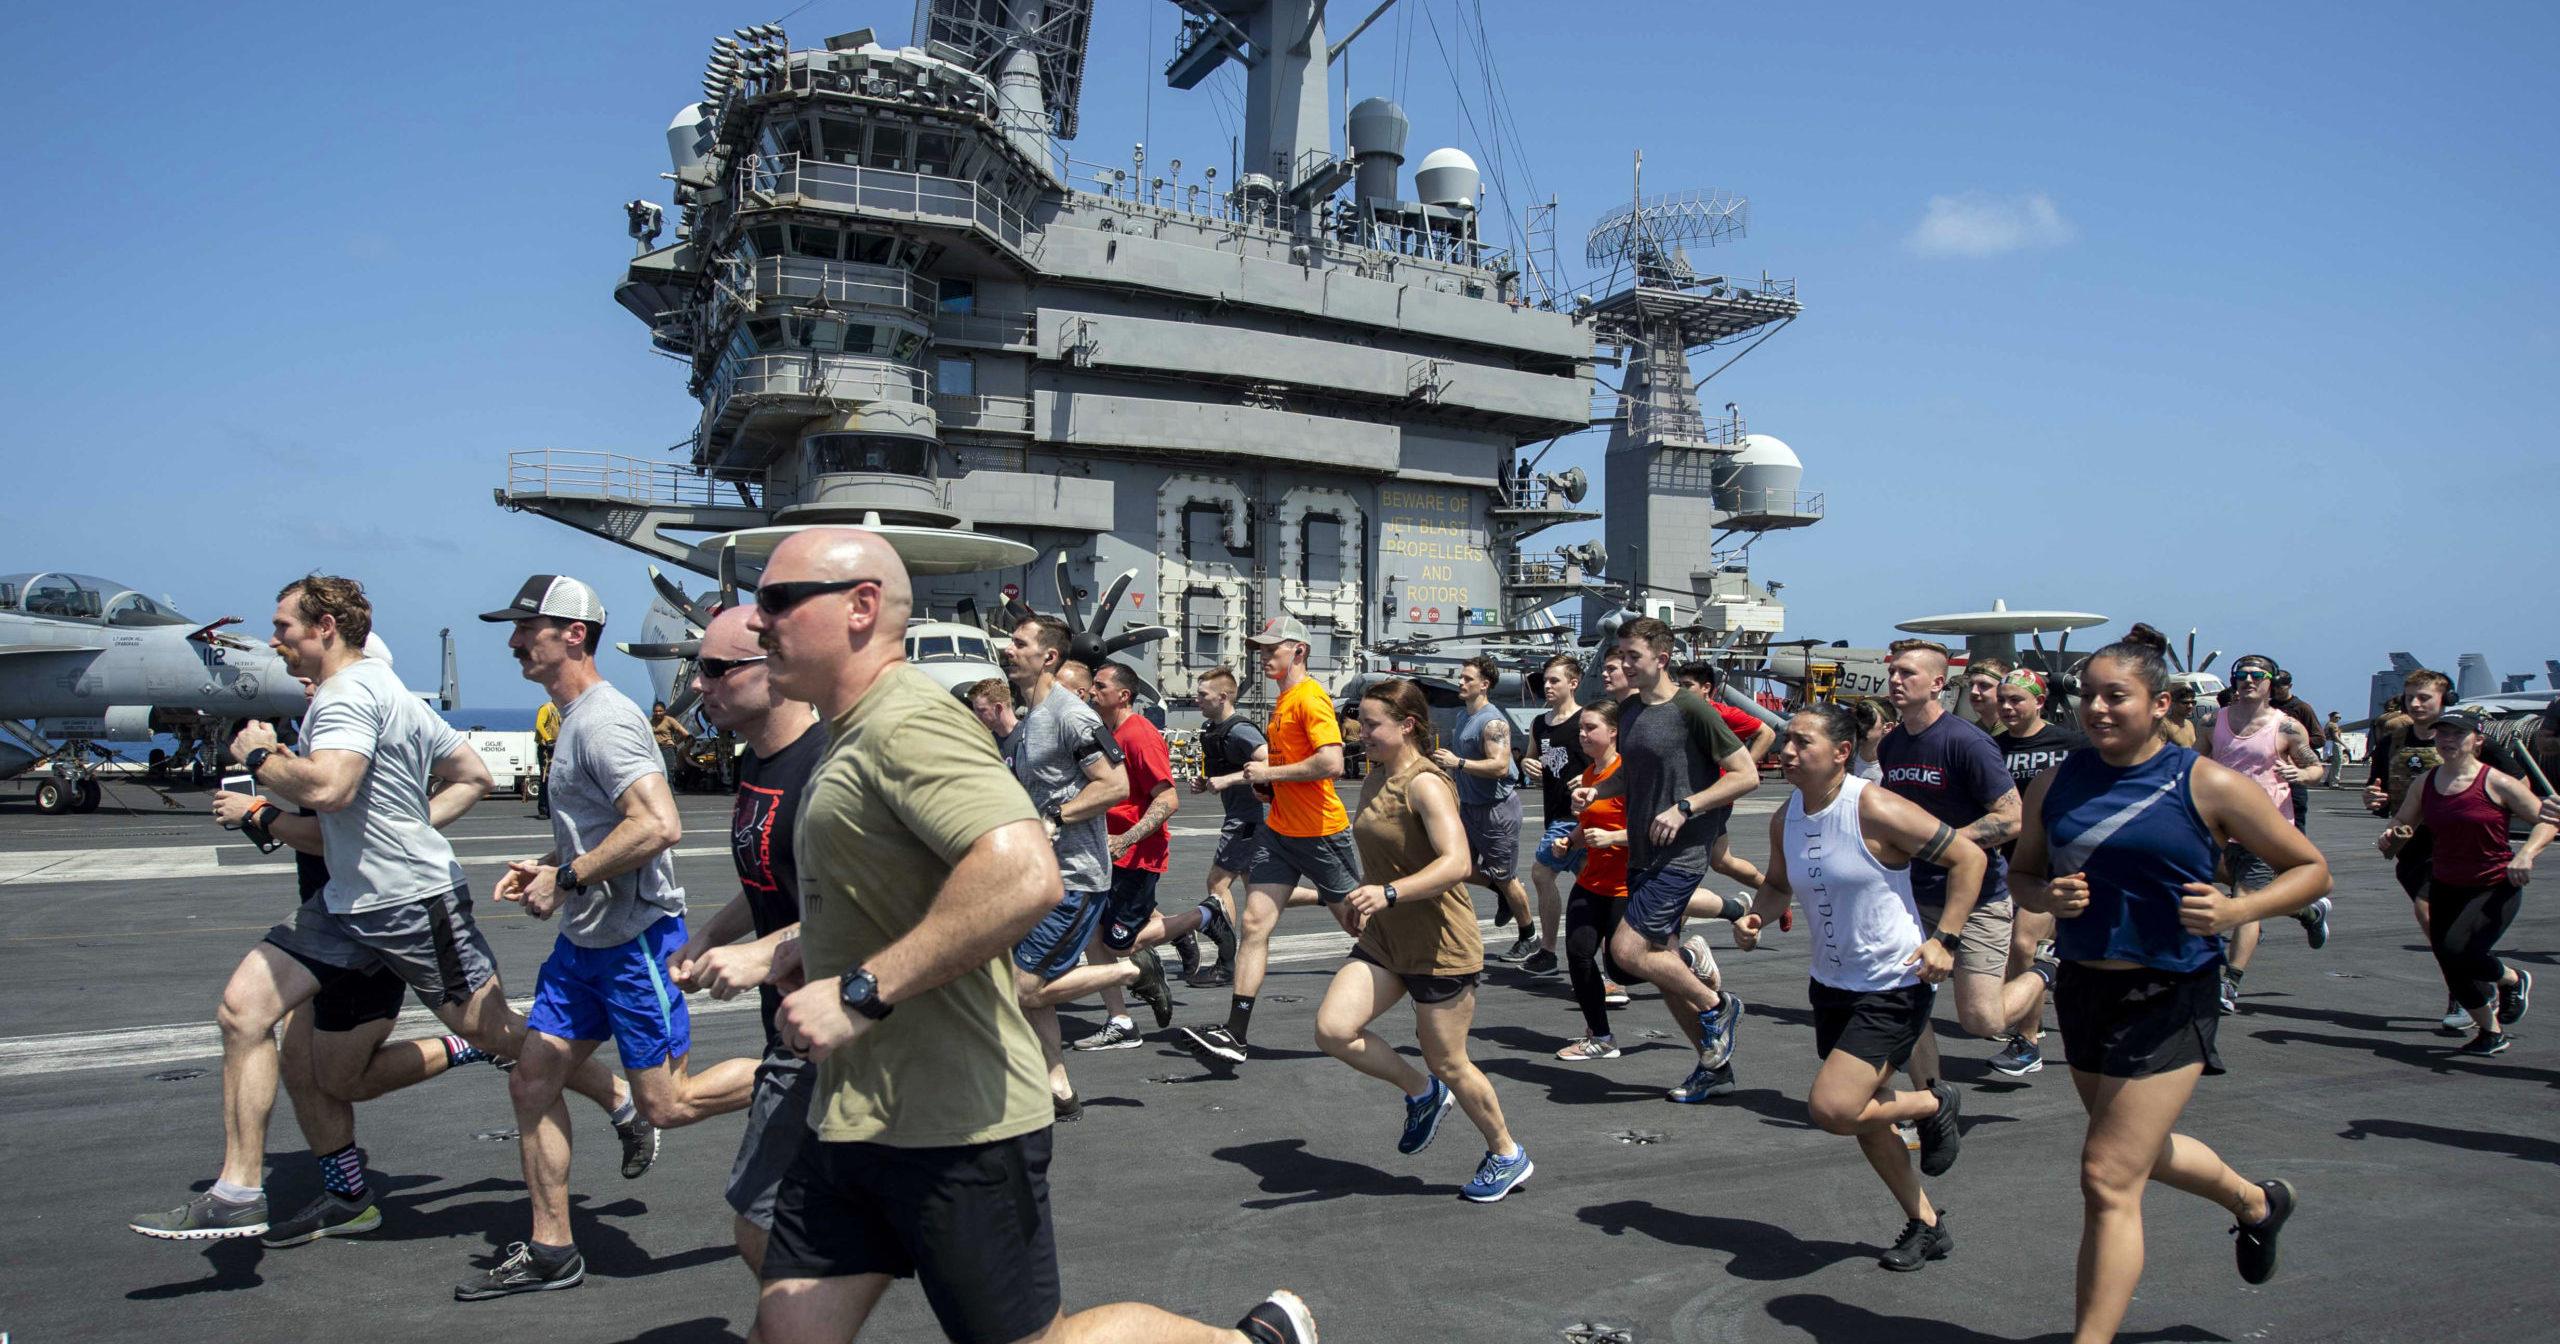 Sailors run on the flight deck of the aircraft carrier USS Dwight D. Eisenhower on May 24, 2020.